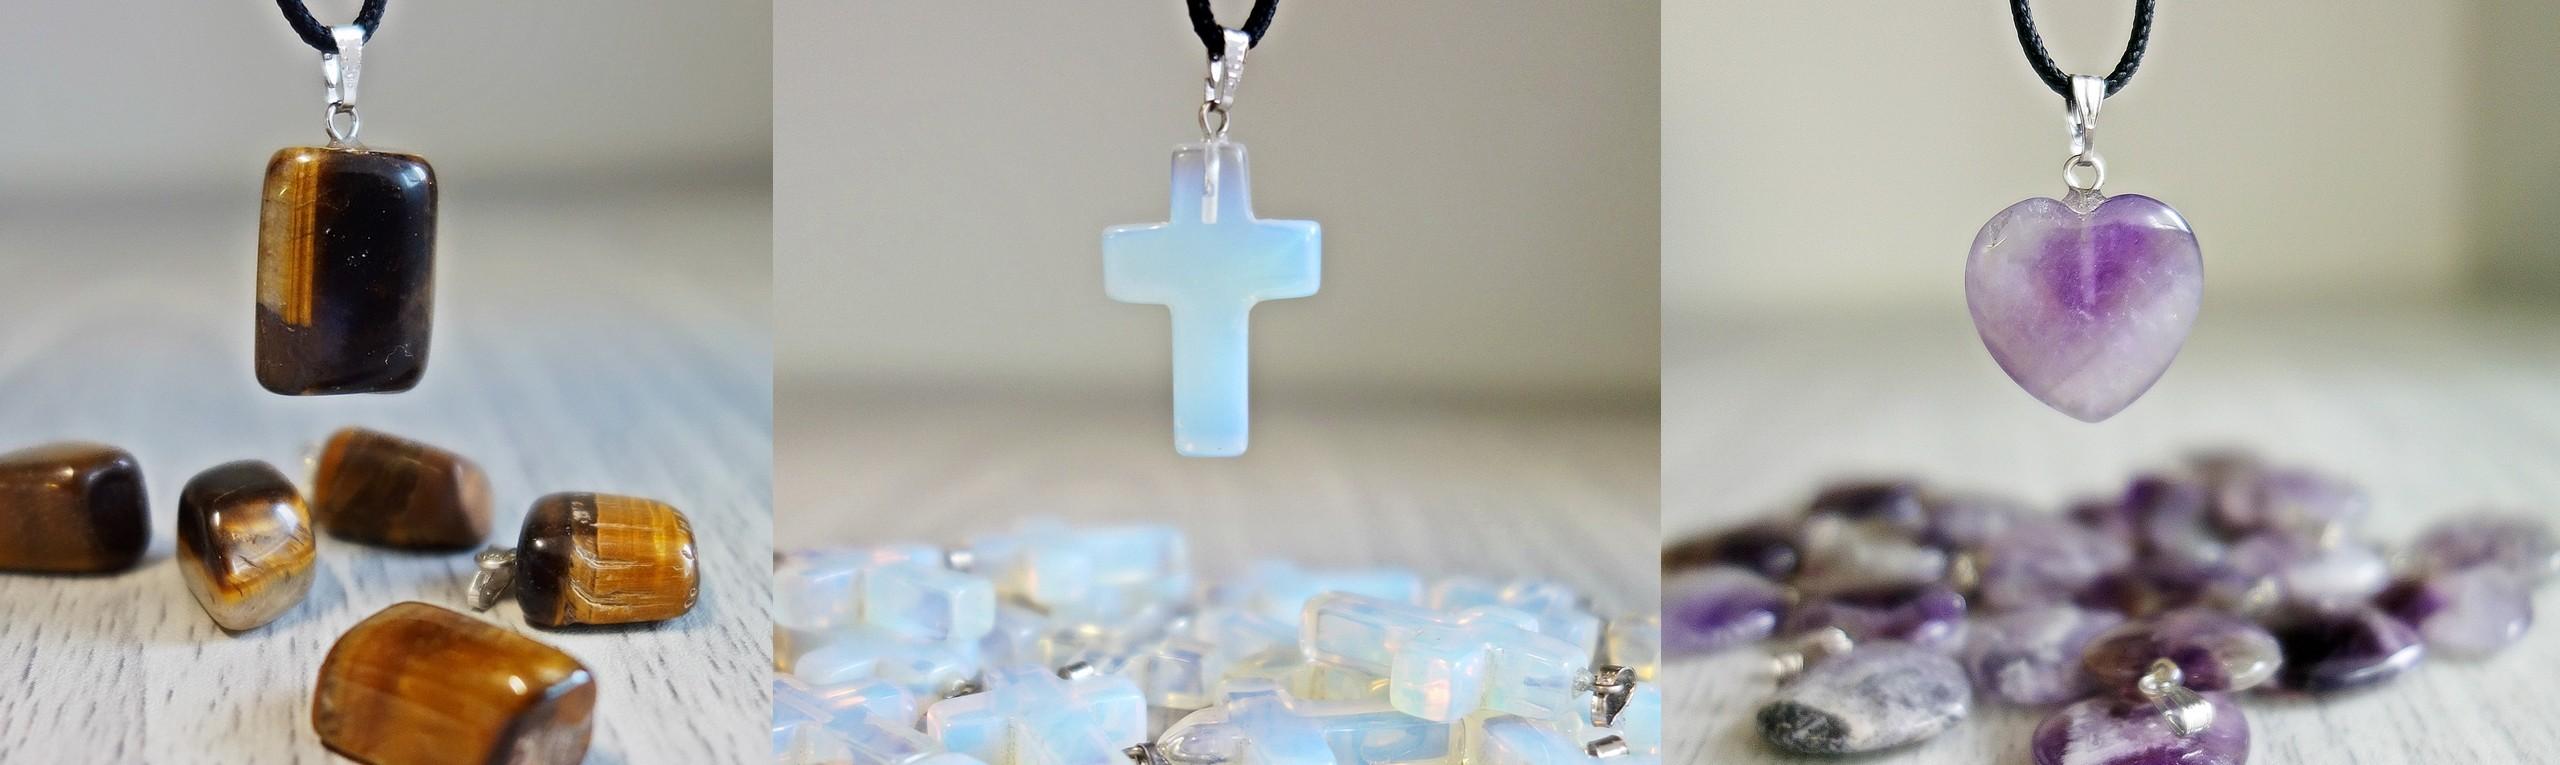 Náhrdelníky z polodrahokamov, mineral, liečiví, kameň, šperky pre Vás